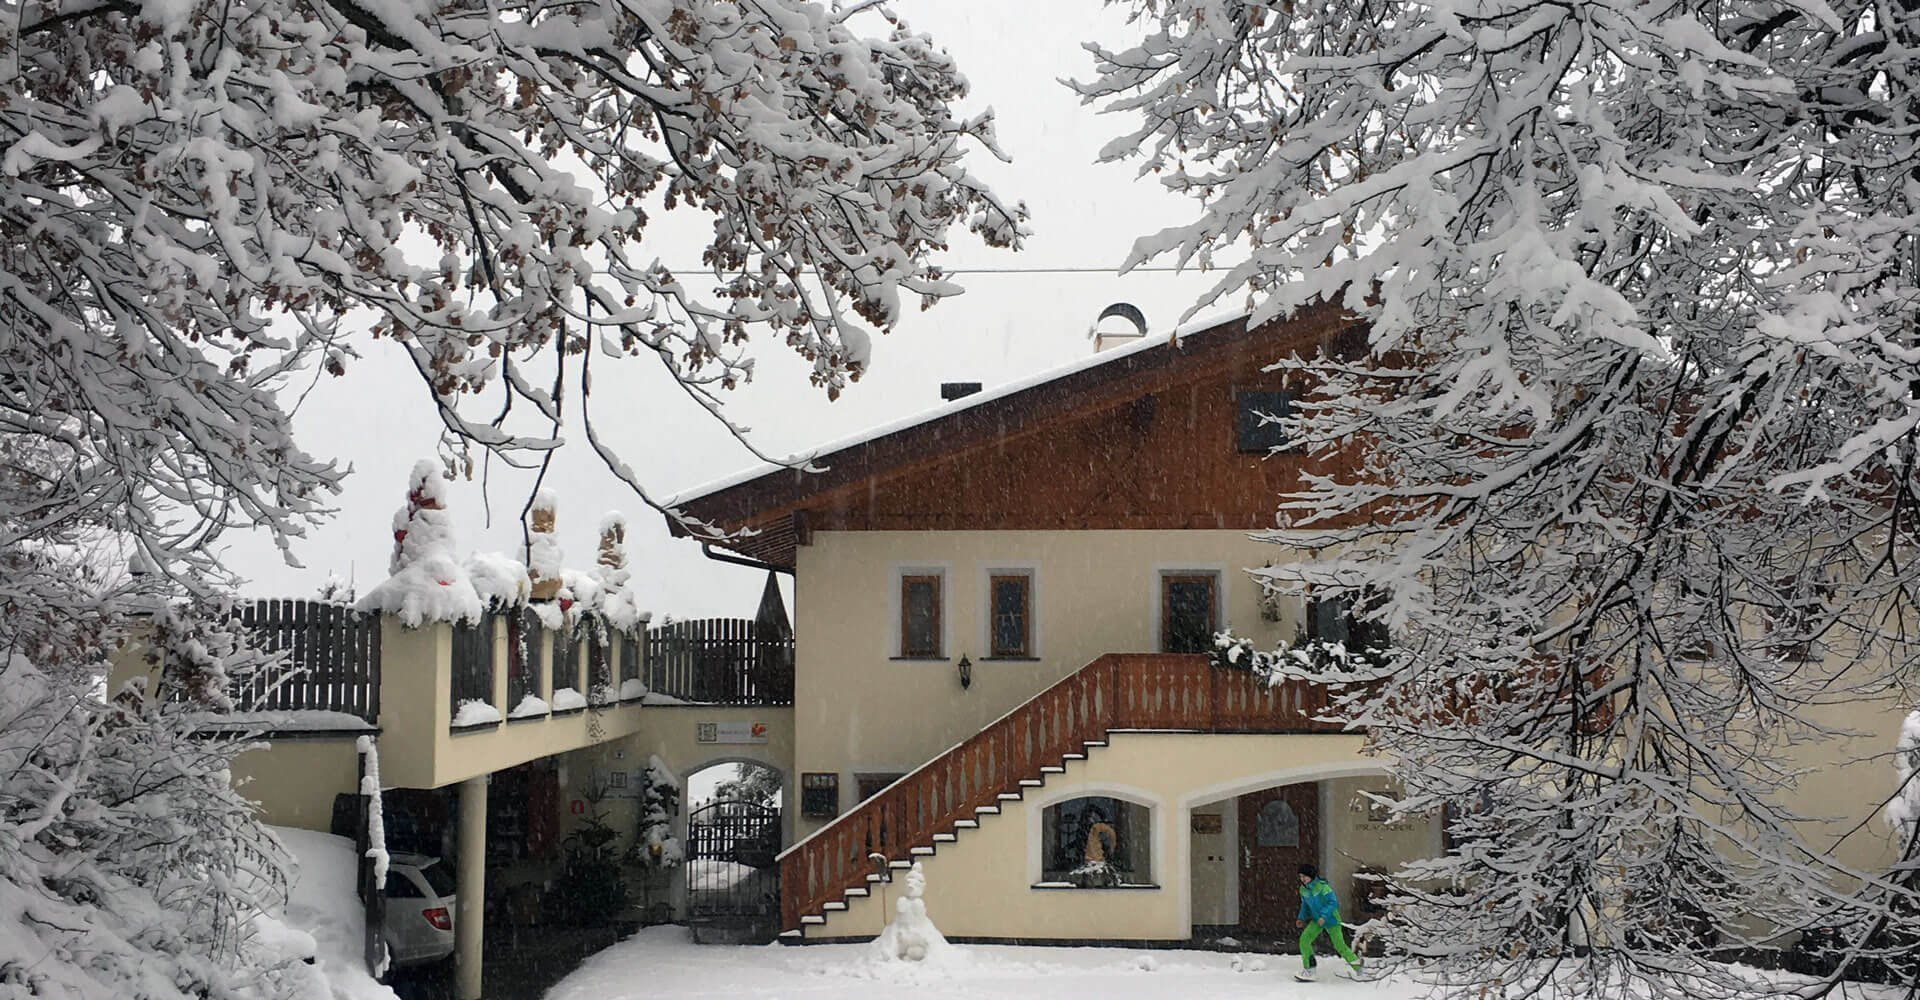 Winterurlaub in den Dolomiten am Prackfolerhof